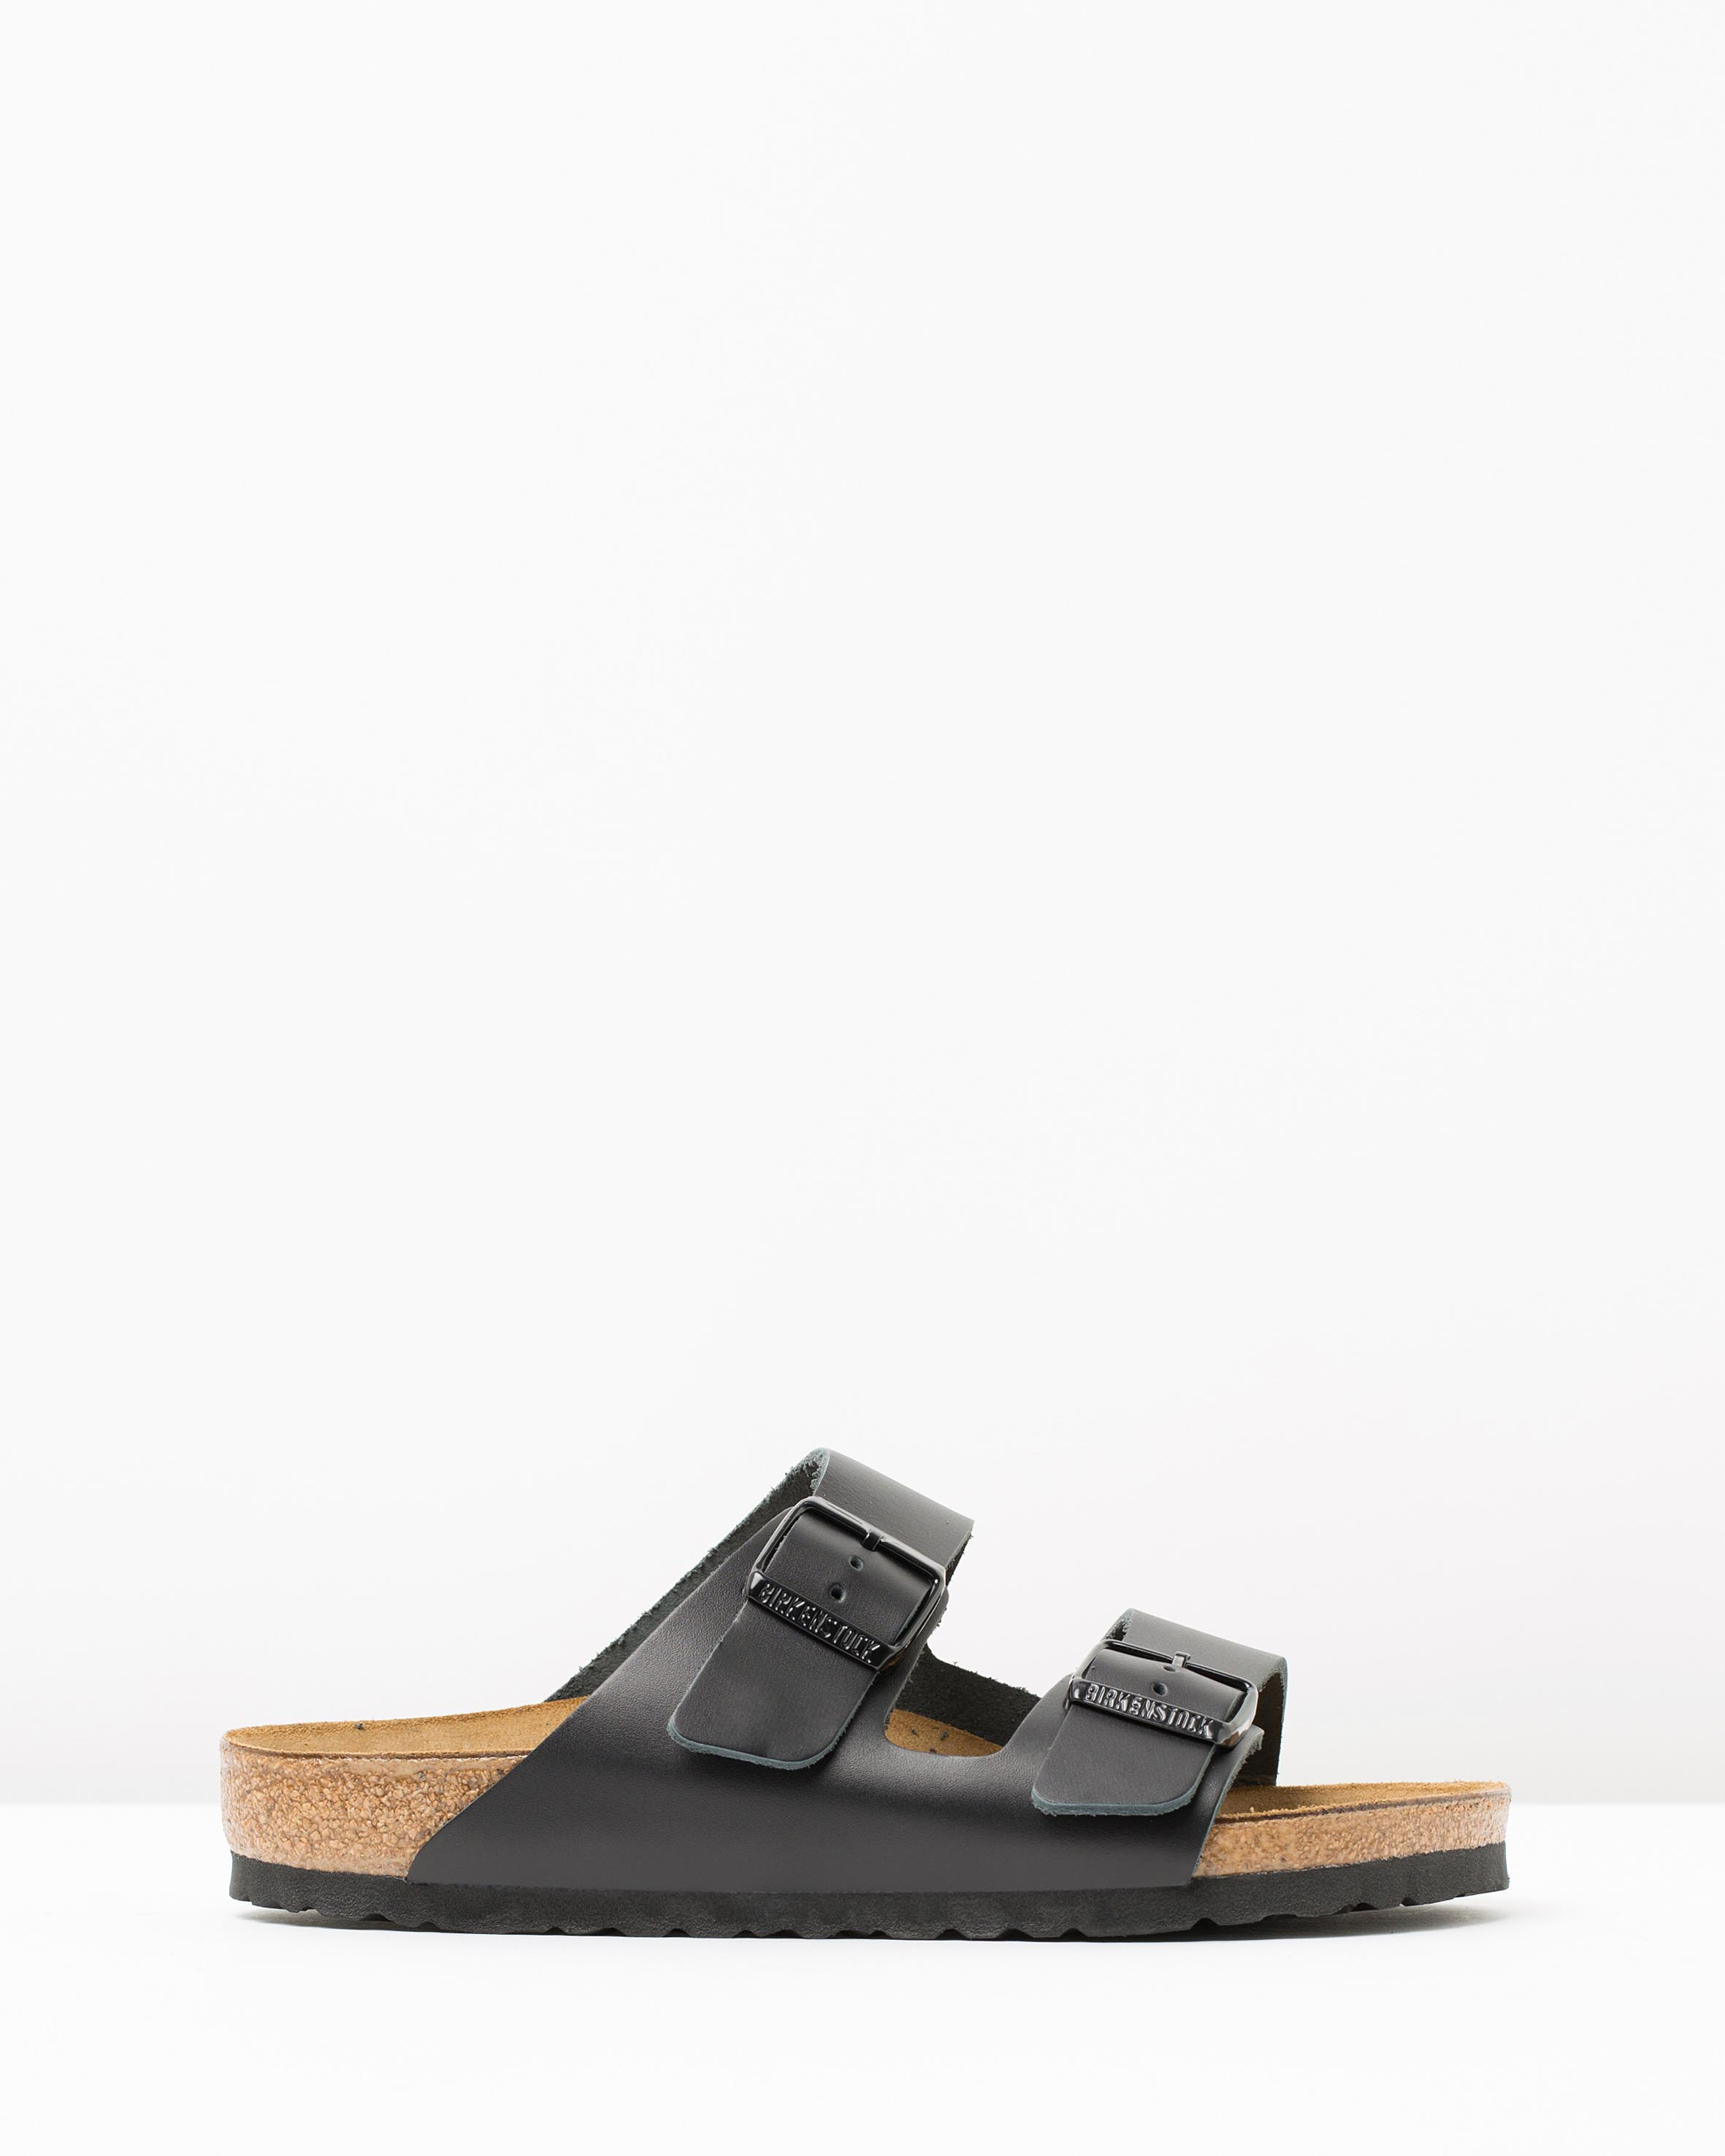 Womens Shoes | Womens Shoes Online Australia | Buy Ladies Shoes